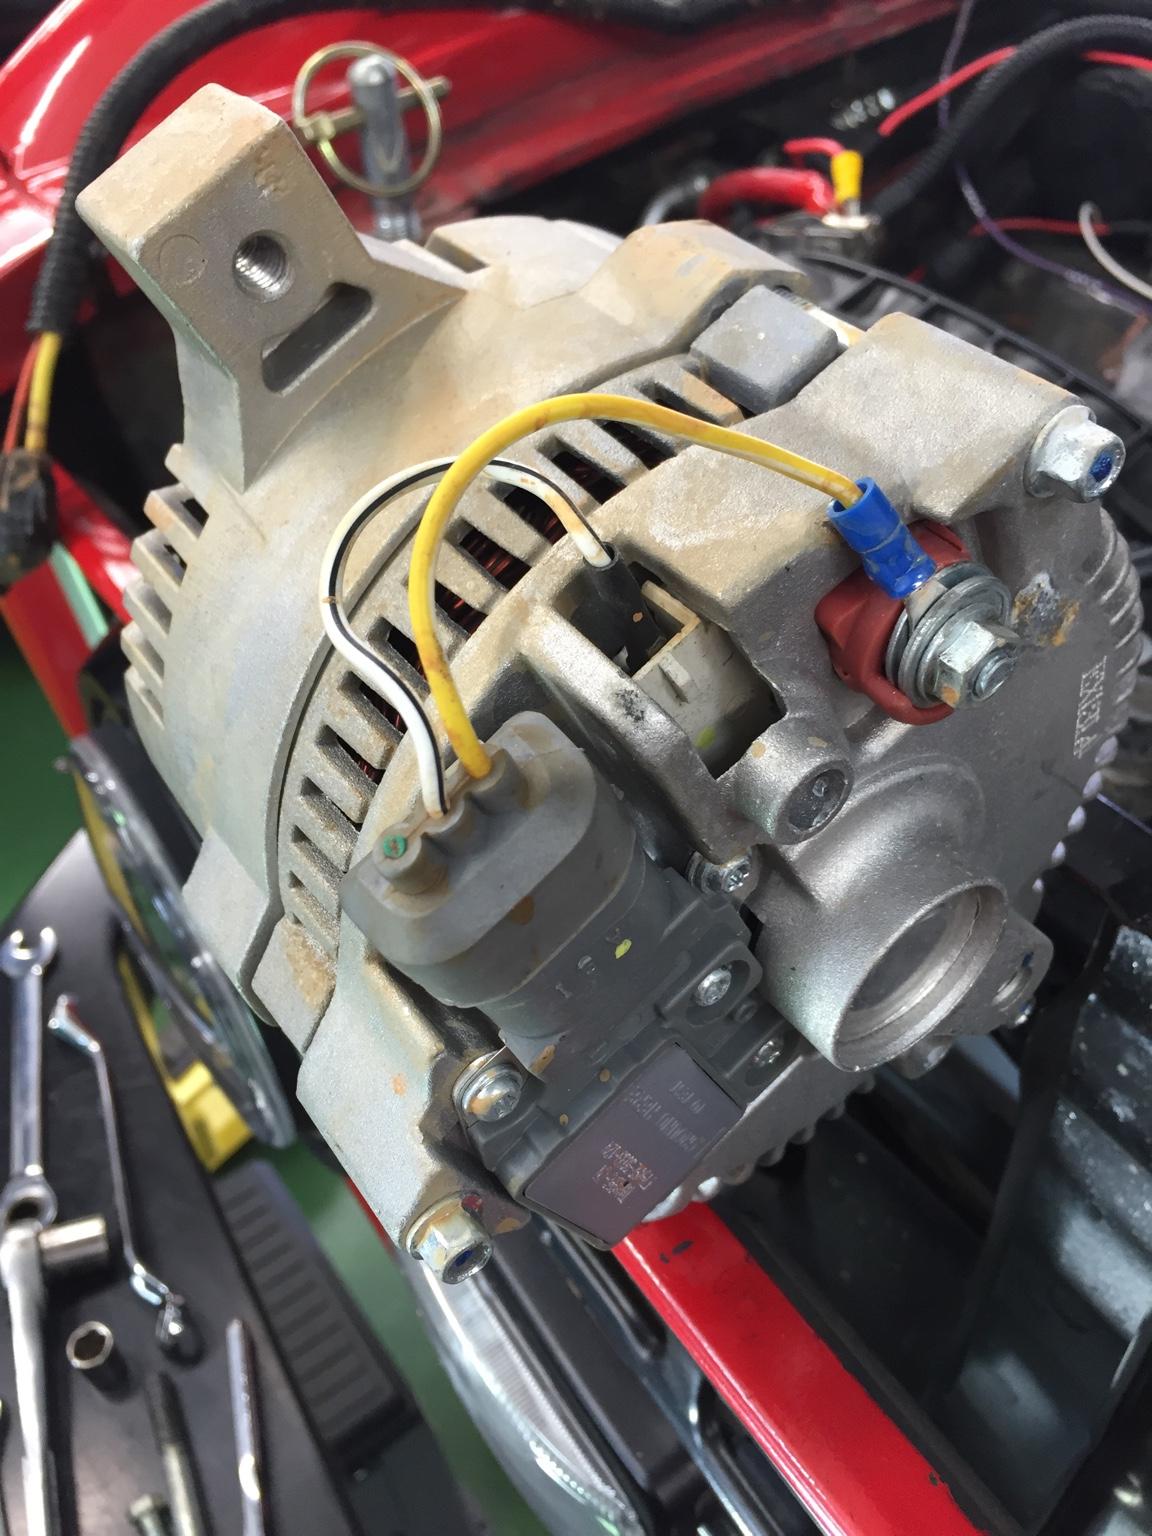 Convert A 1-wire Alternator To A 3-wire